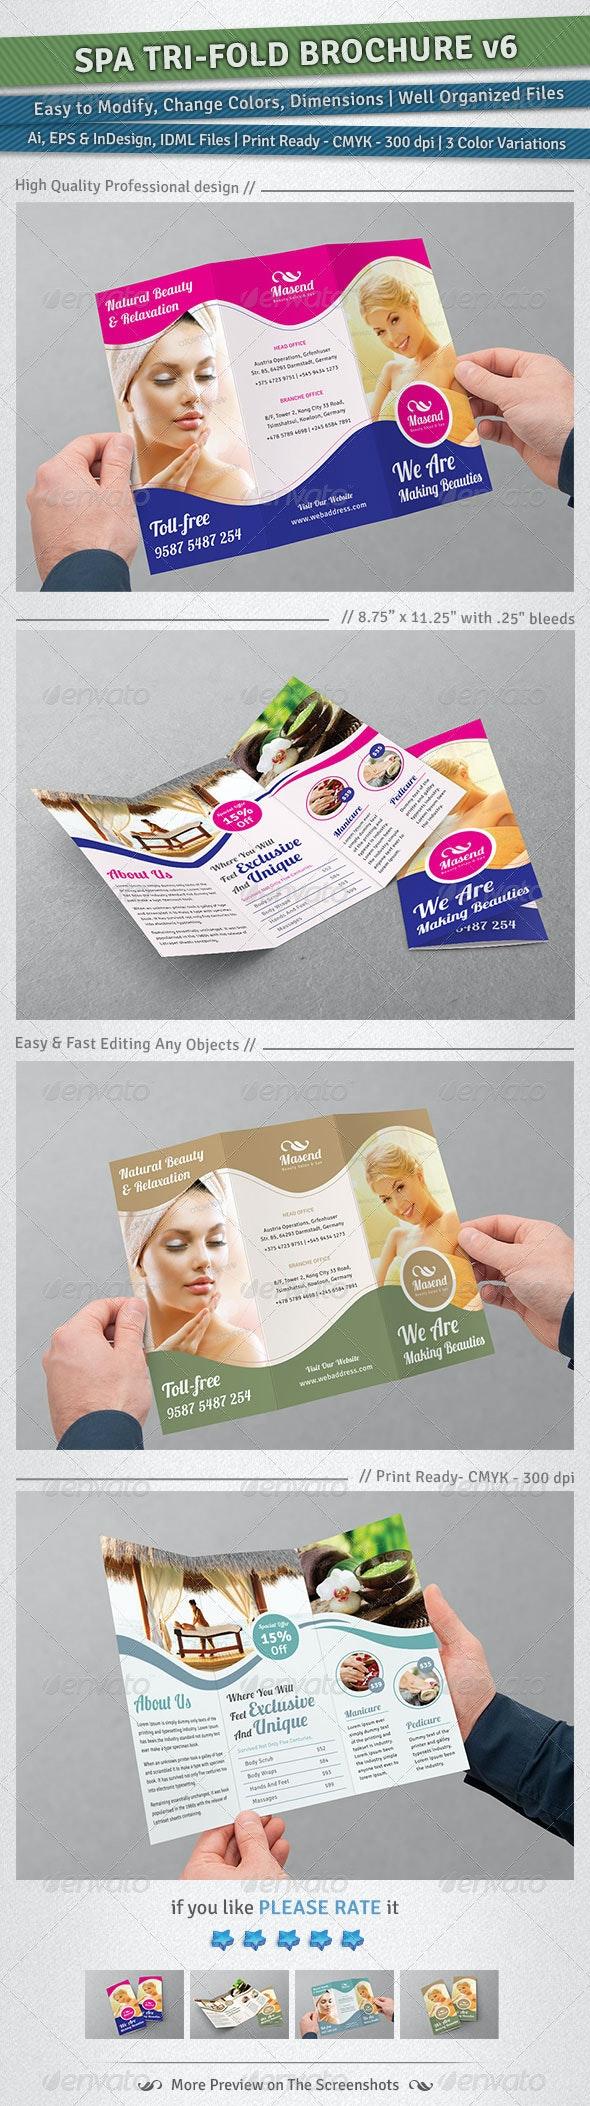 Spa Tri-Fold Brochure | Volume 6 - Corporate Brochures